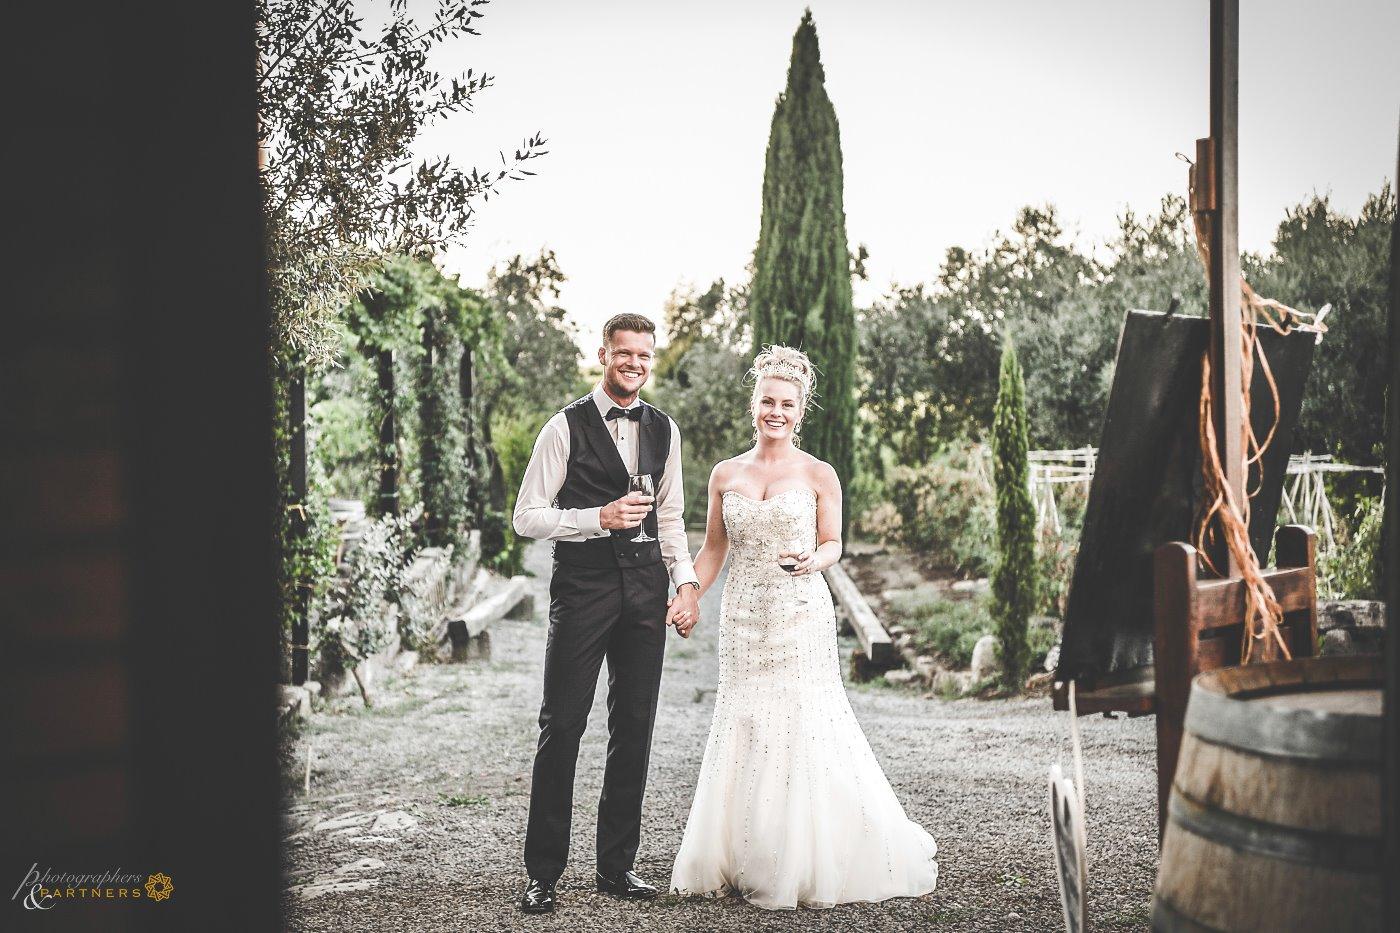 photo_weddings_frascati_18.jpg